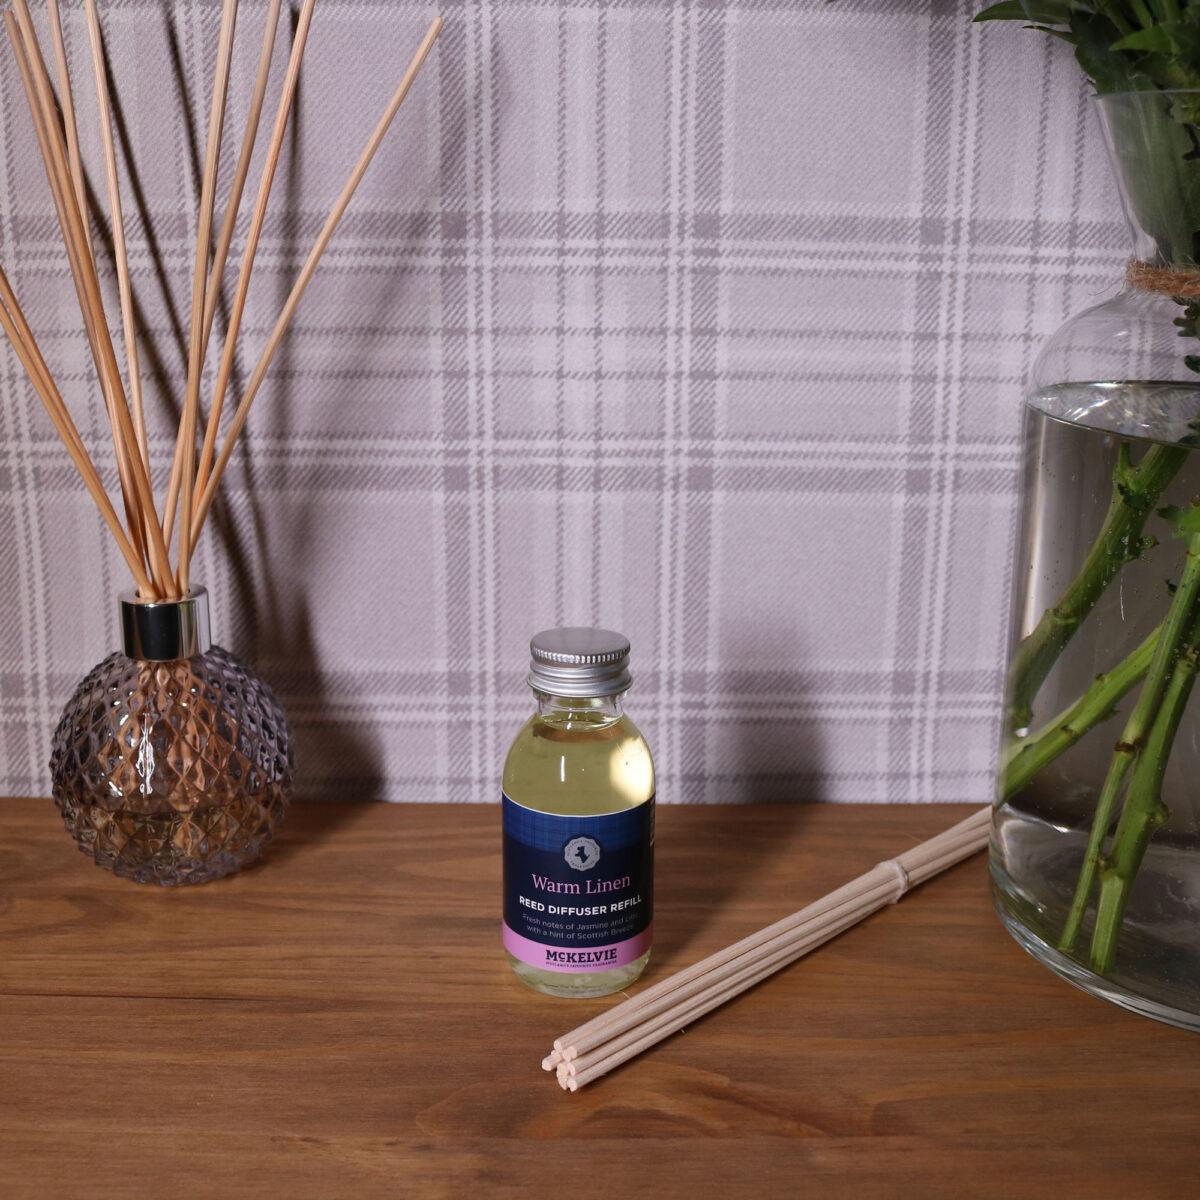 Warm Linen Reed Diffuser Refill